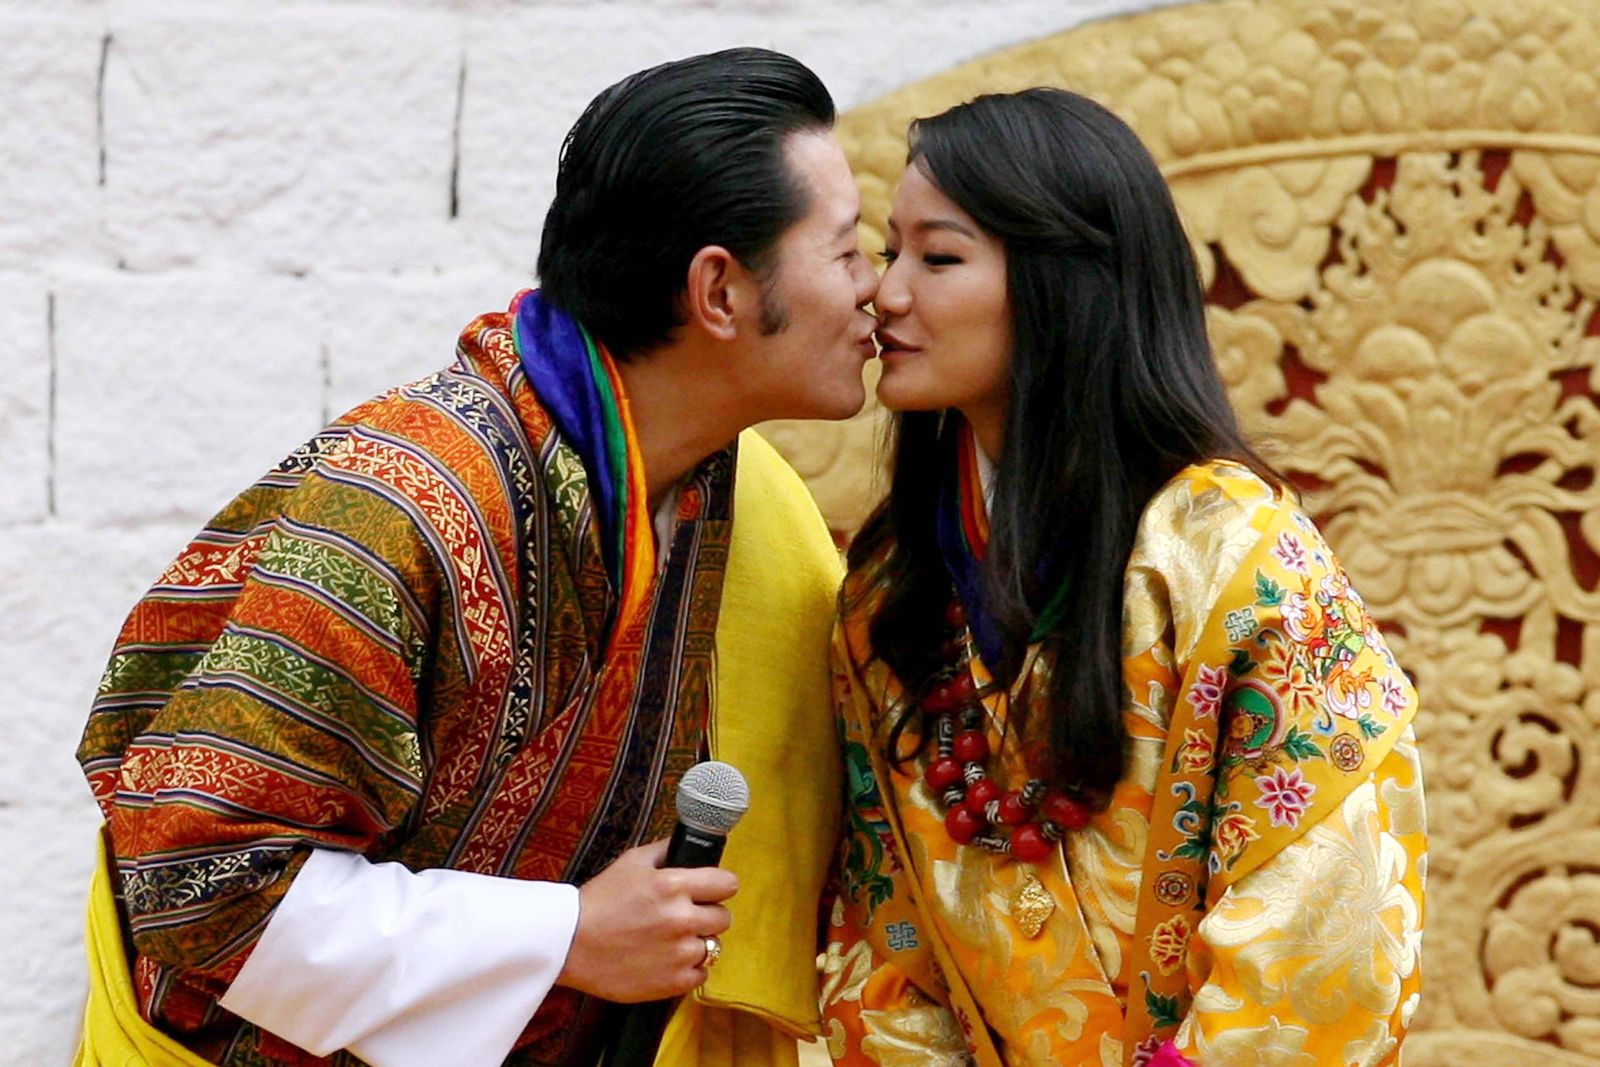 Bhutan Kuss Biga